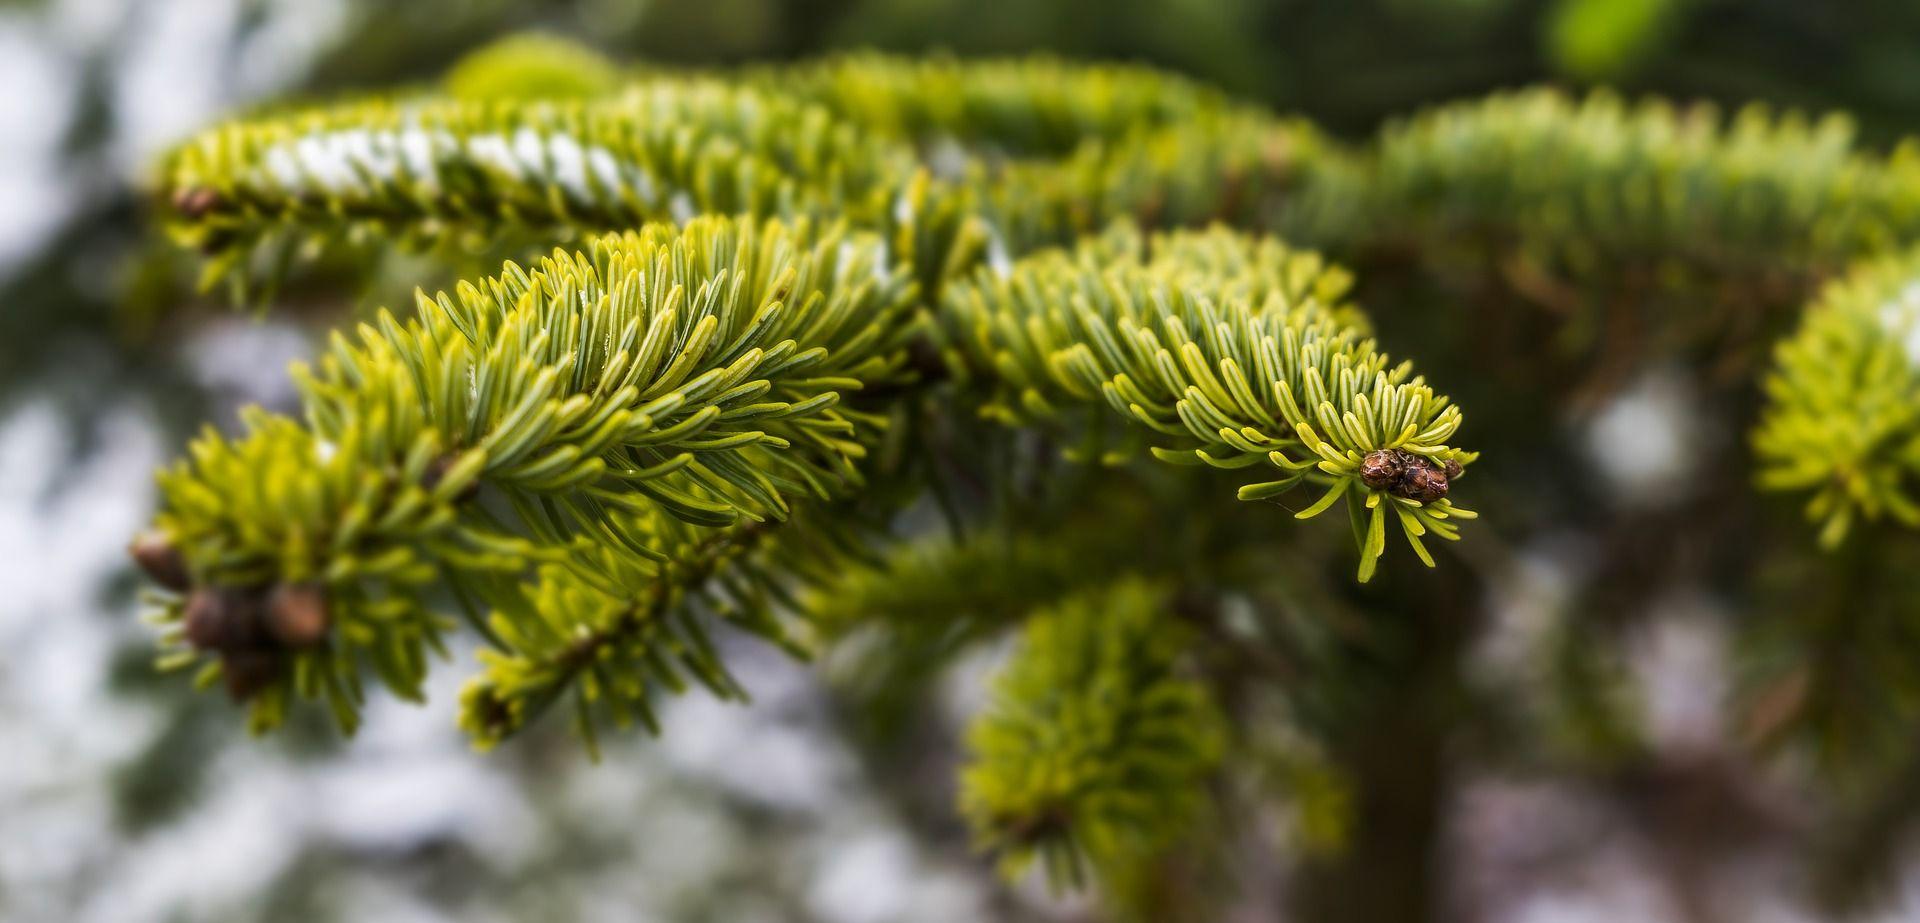 Afera s preskupim božićnim drvcem trese upravu Beograda